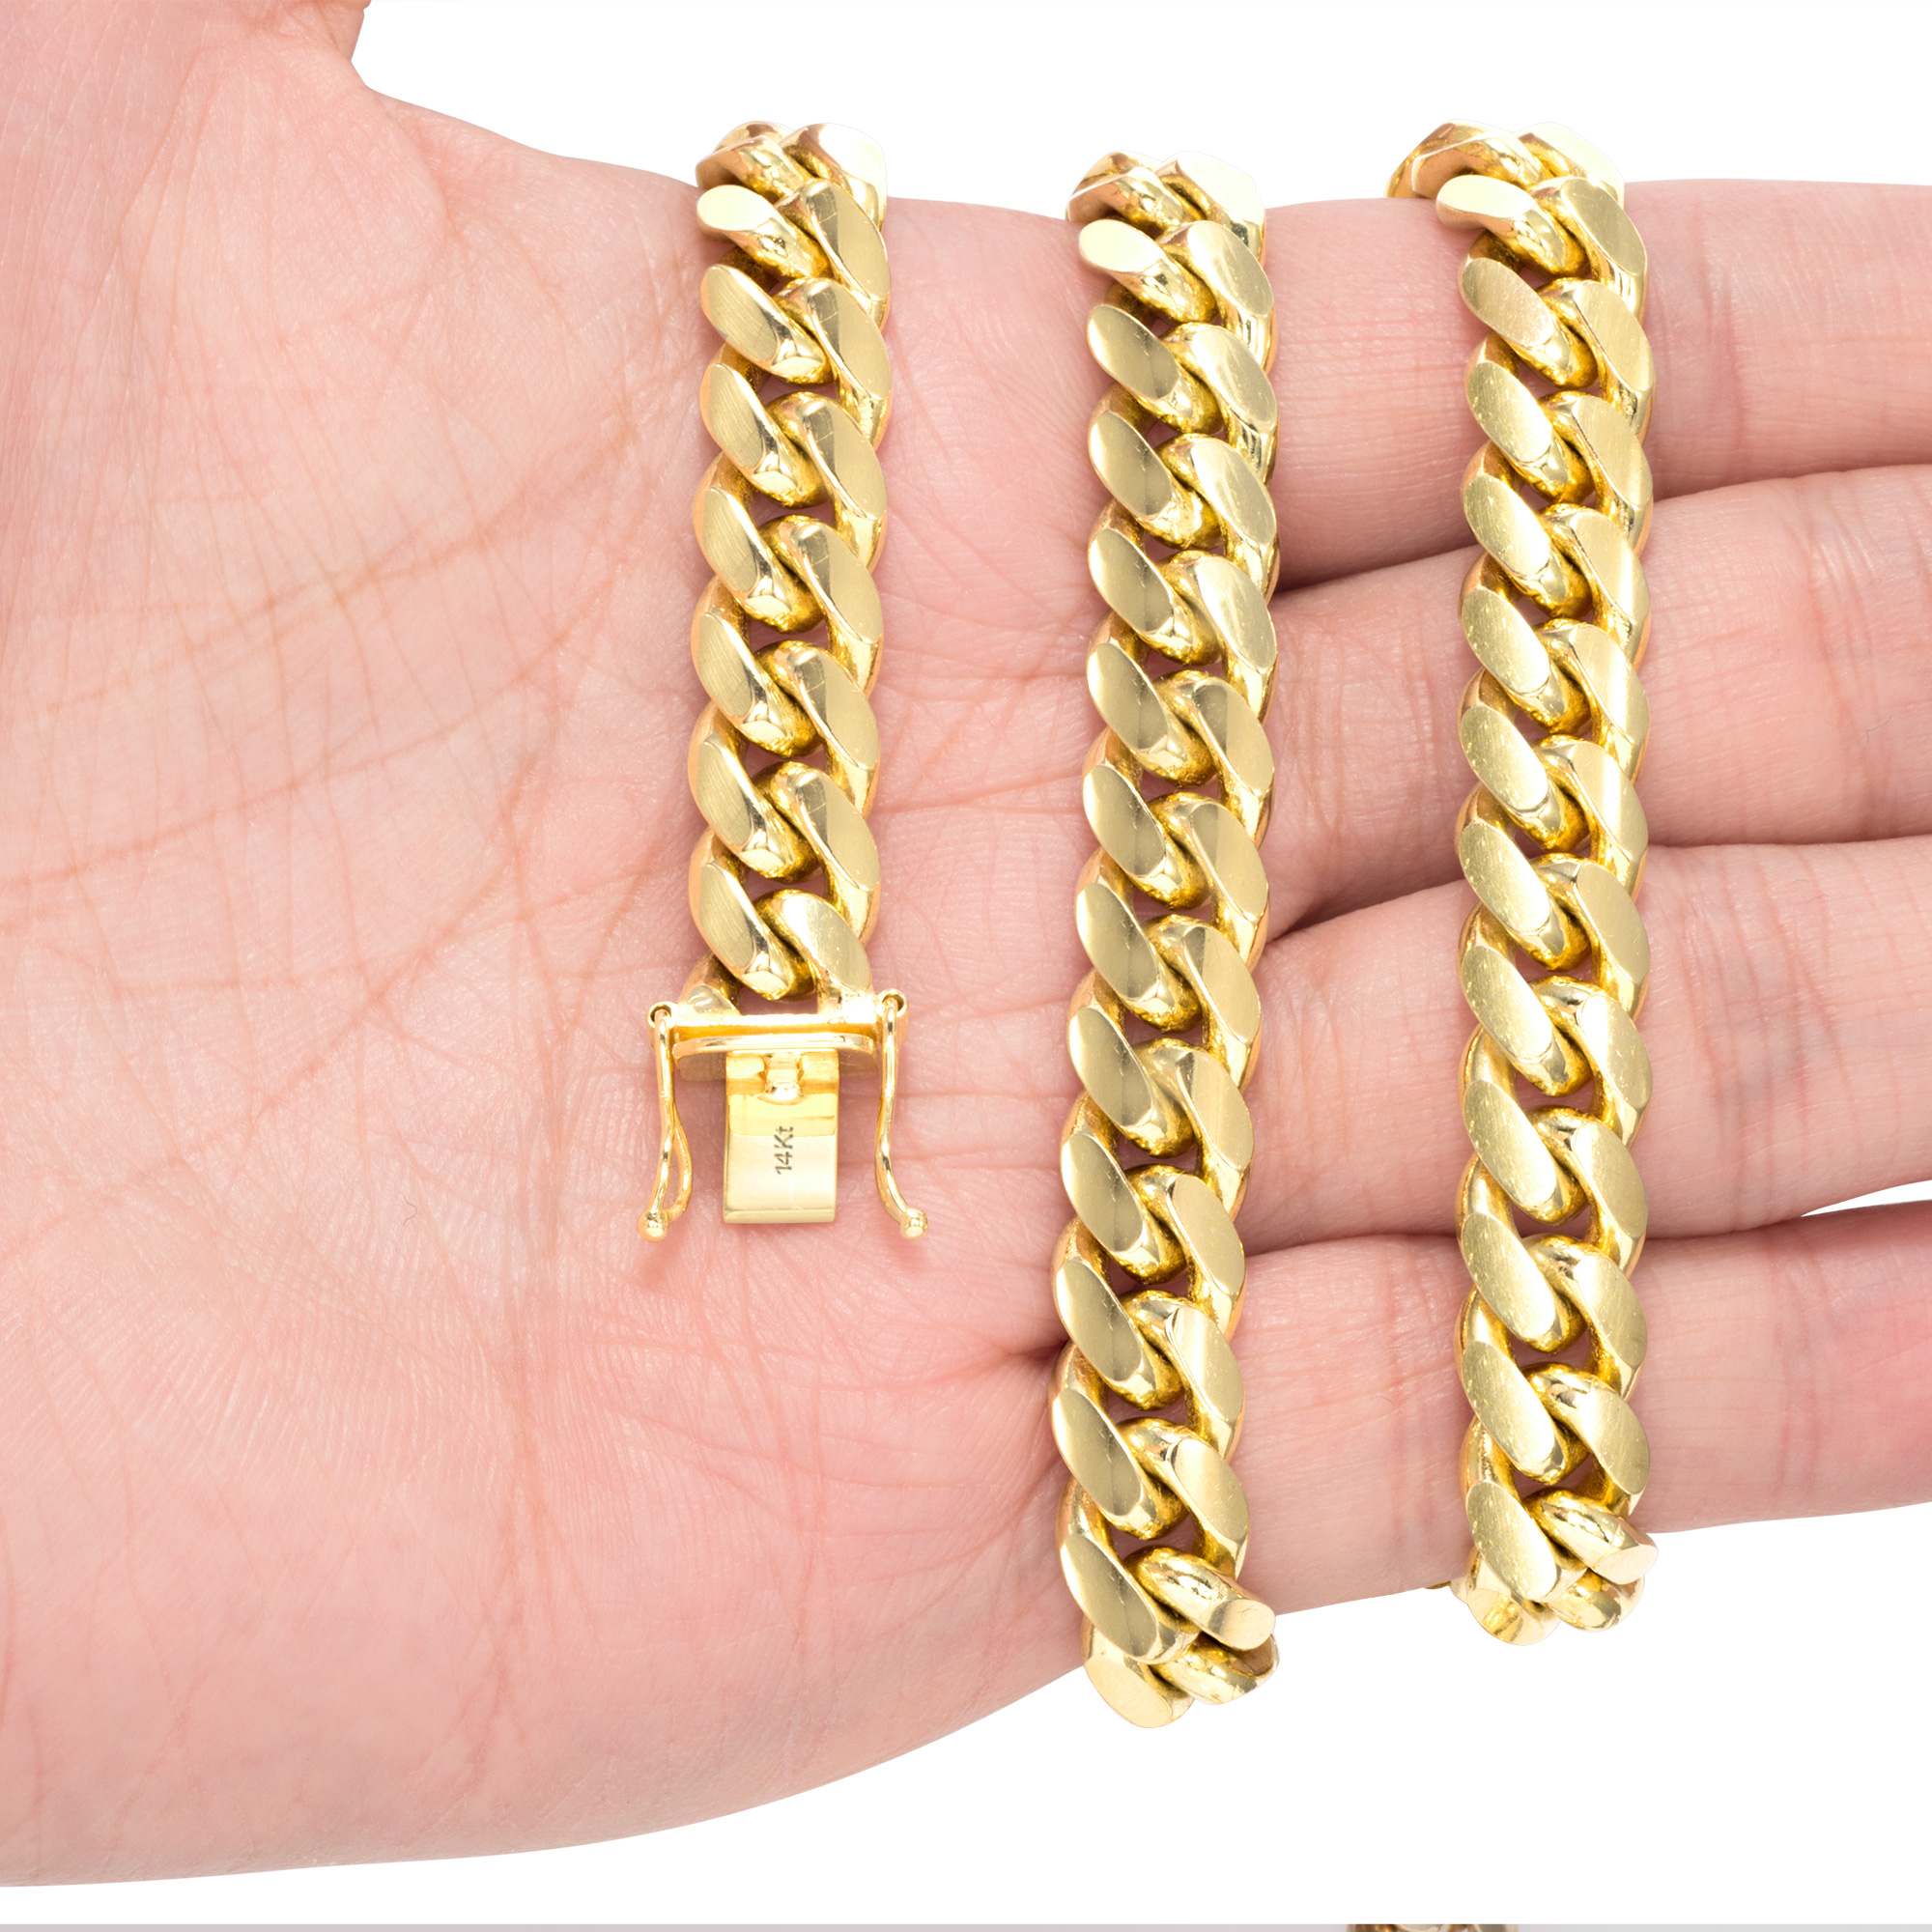 14K-Yellow-Gold-Solid-2-7mm-11mm-Miami-Cuban-Link-Chain-Bracelet-Men-Women-7-034-9-034 thumbnail 27